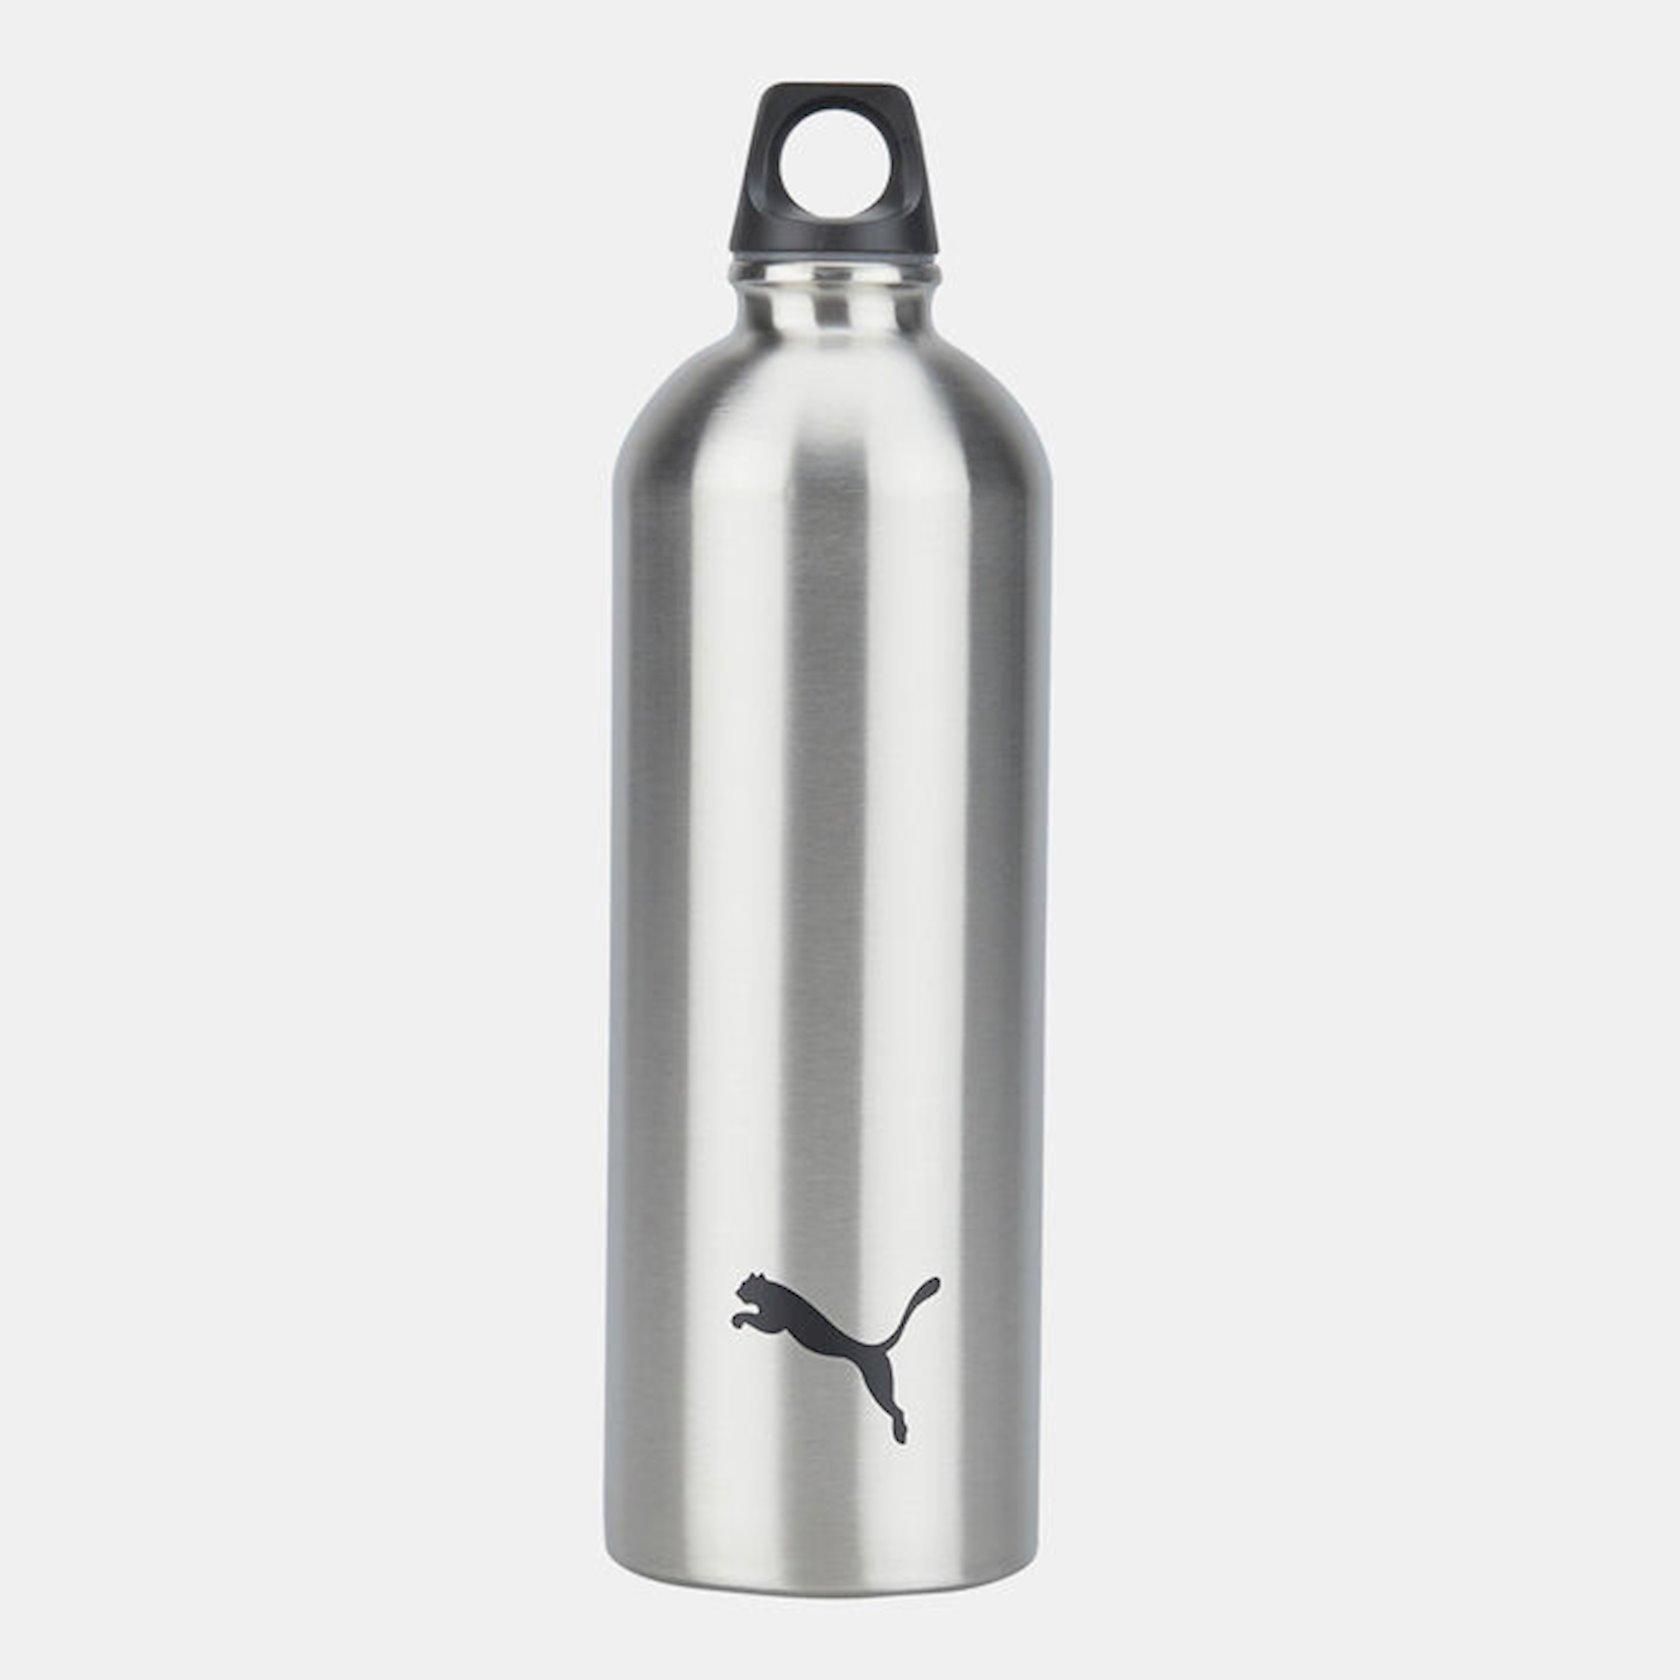 Butulka Puma Training Stainless Steel Bottle, 600 ml, Gümüşü